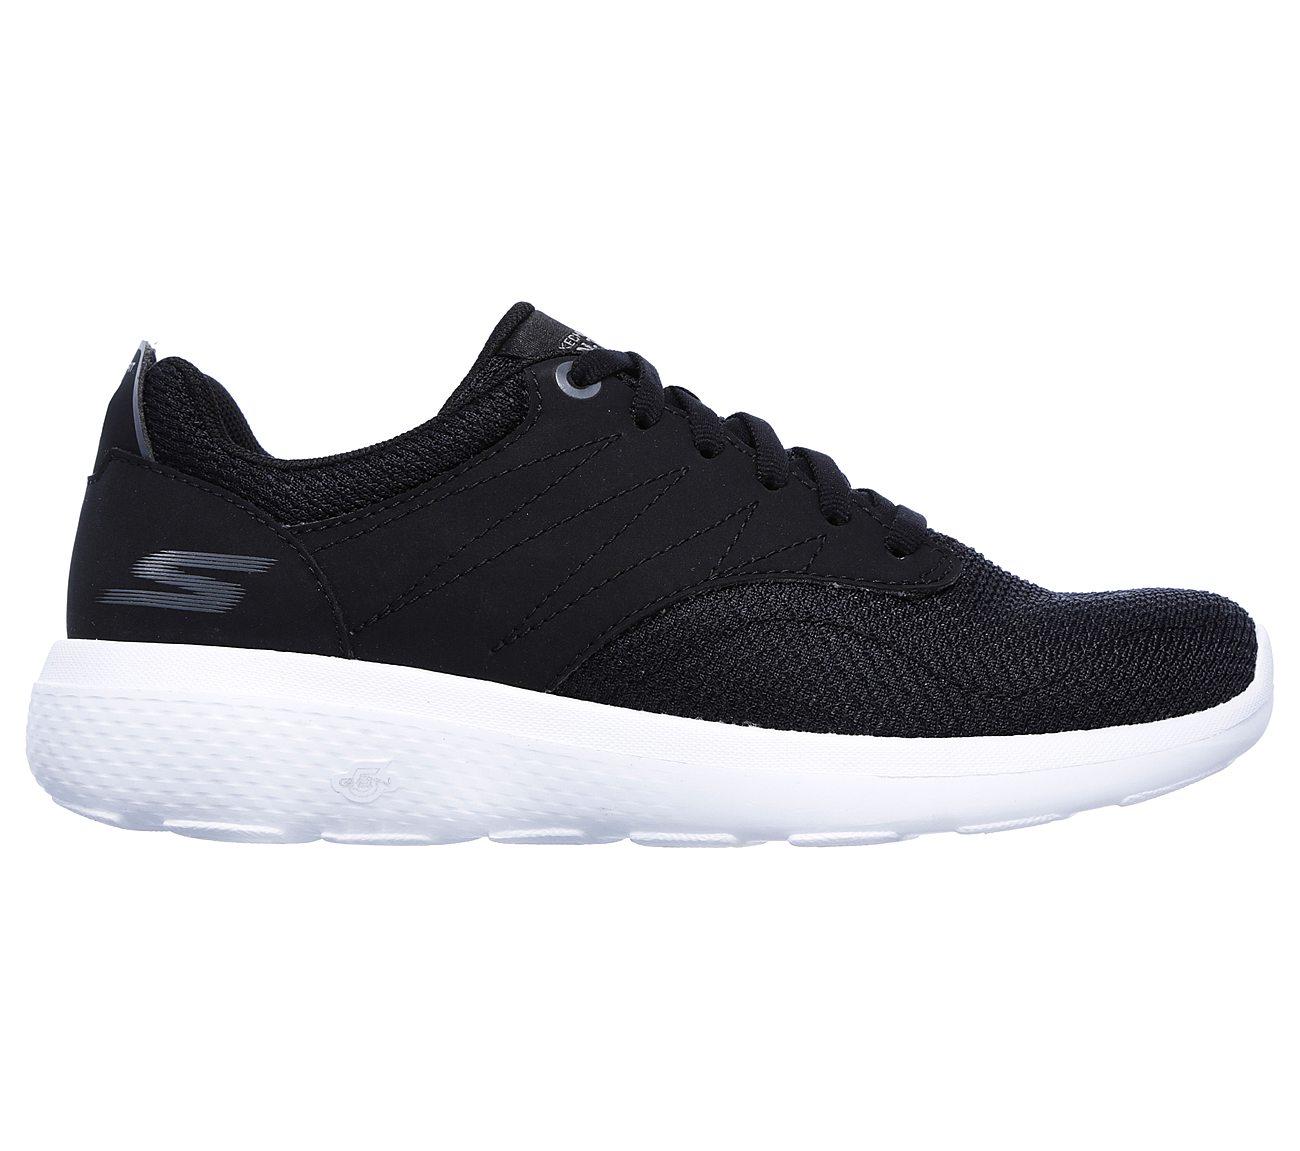 2b591576cff4 Buy SKECHERS Skechers On The GO City 2 Skechers Performance Shoes ...